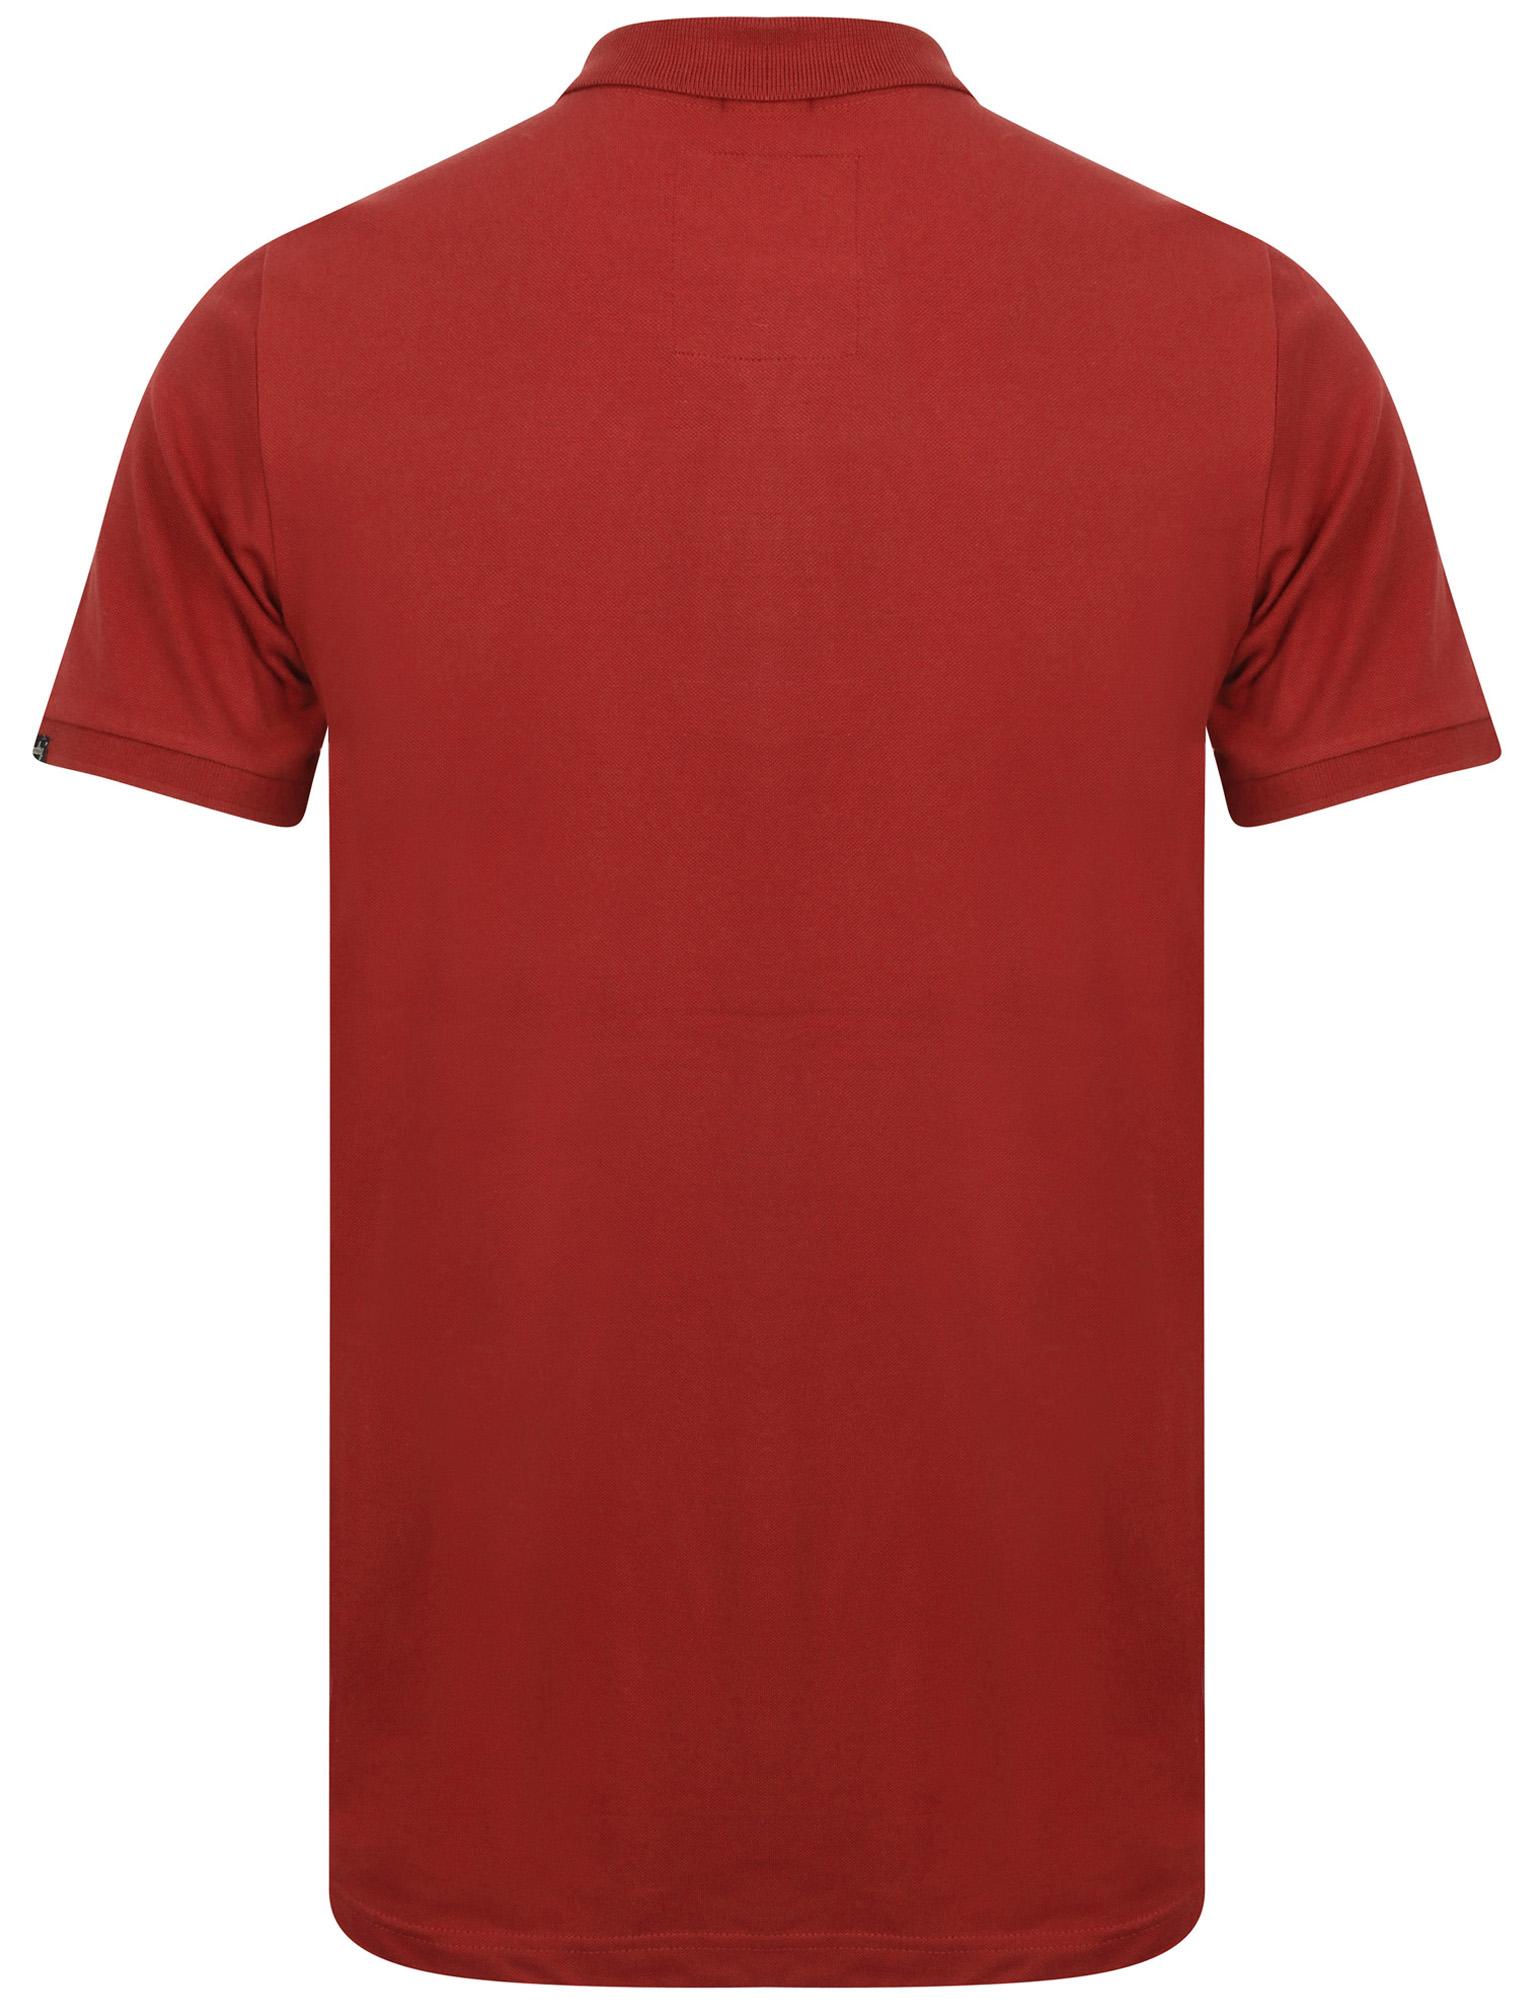 New-Mens-Tokyo-Laundry-Branded-Kuusamo-Cotton-Rich-Pique-Polo-Shirt-Size-S-XXL thumbnail 33